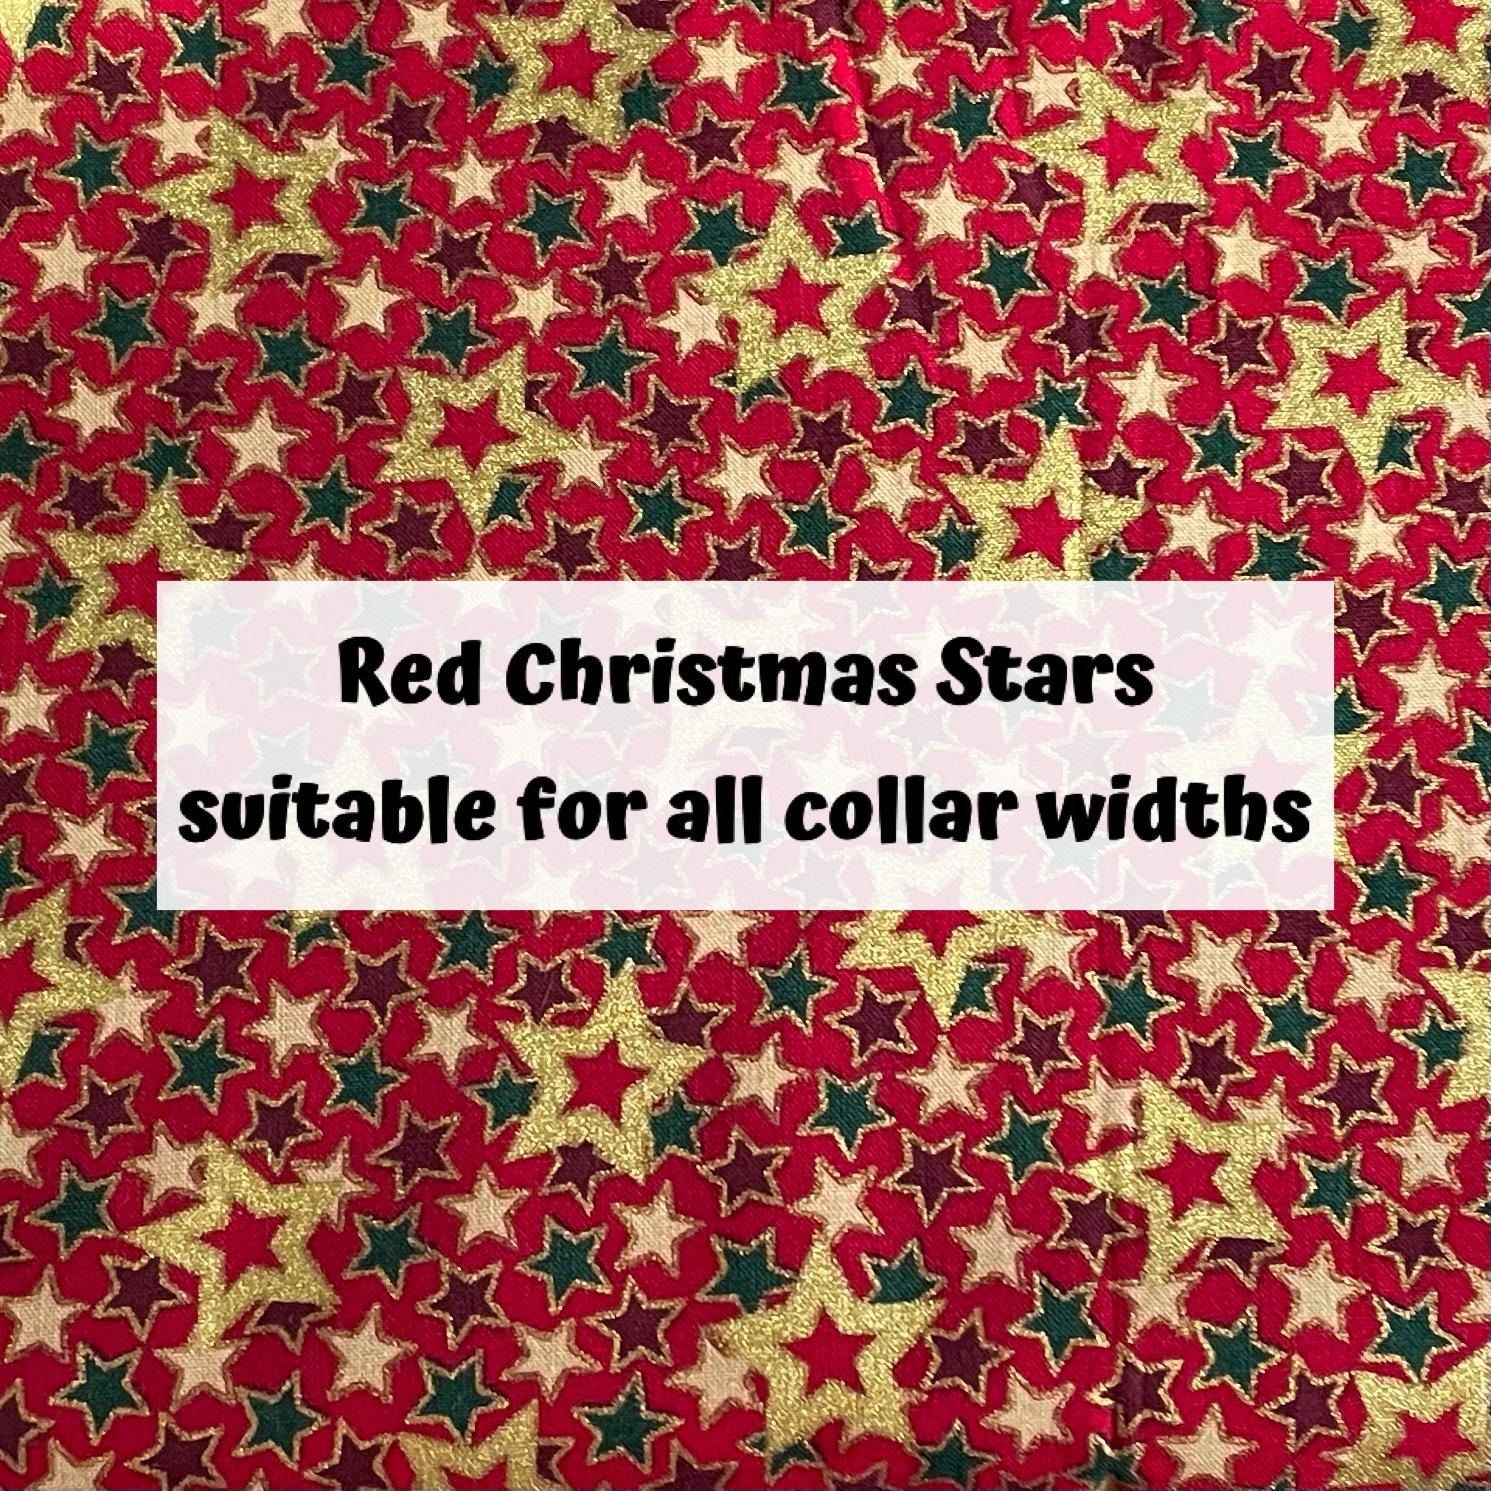 Red Christmas Stars